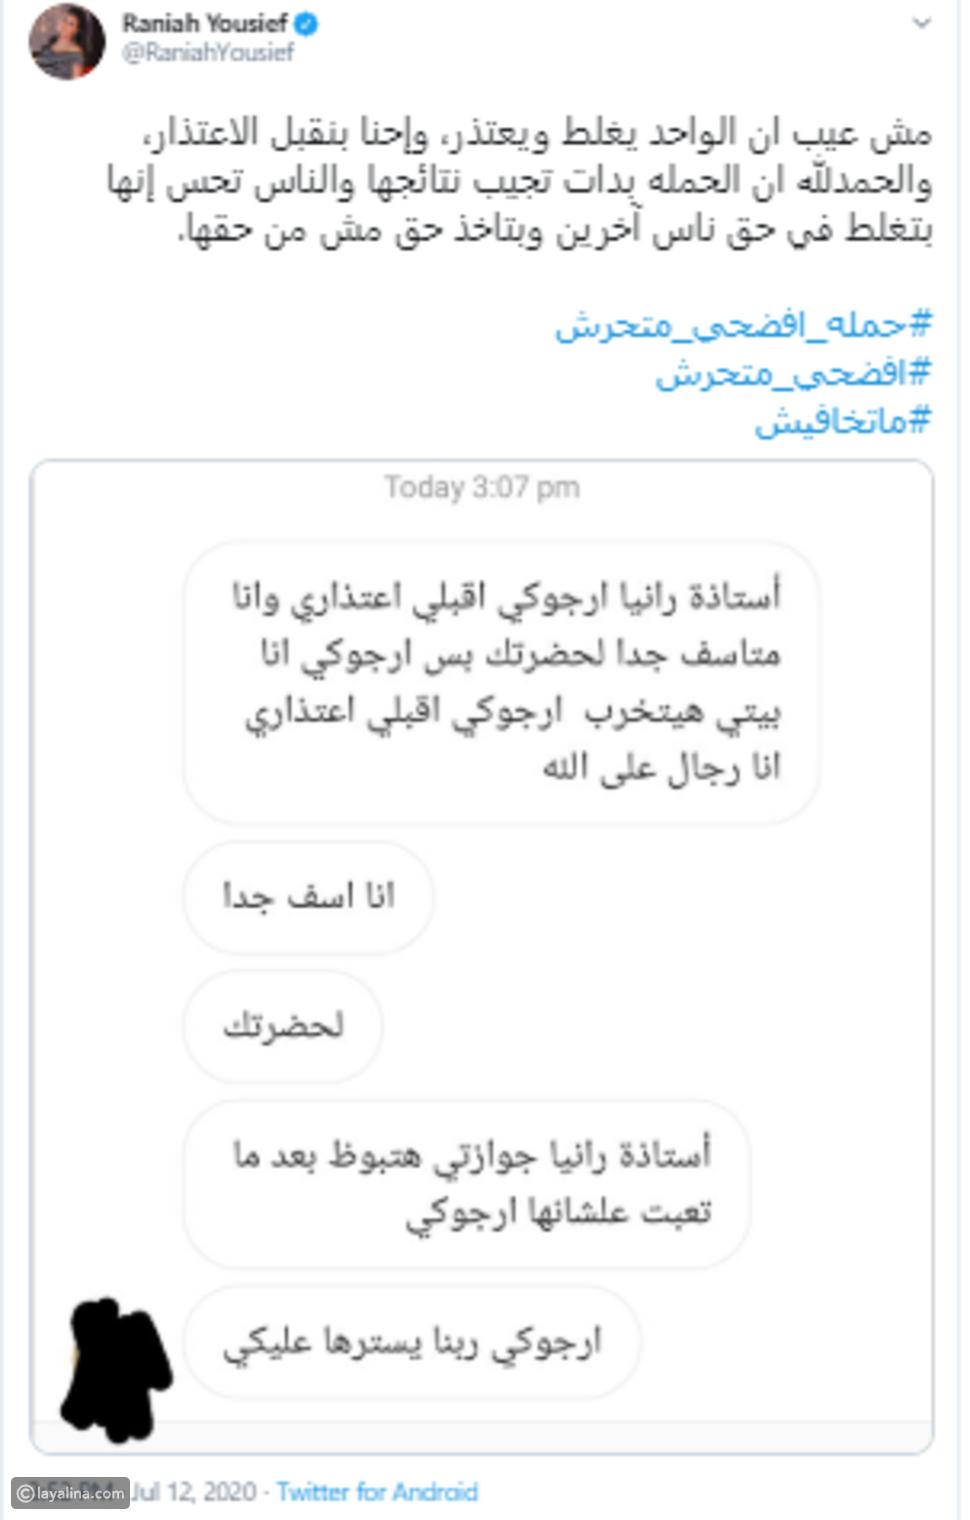 رانيا يوسف تقبل اعتذار متحرش بها